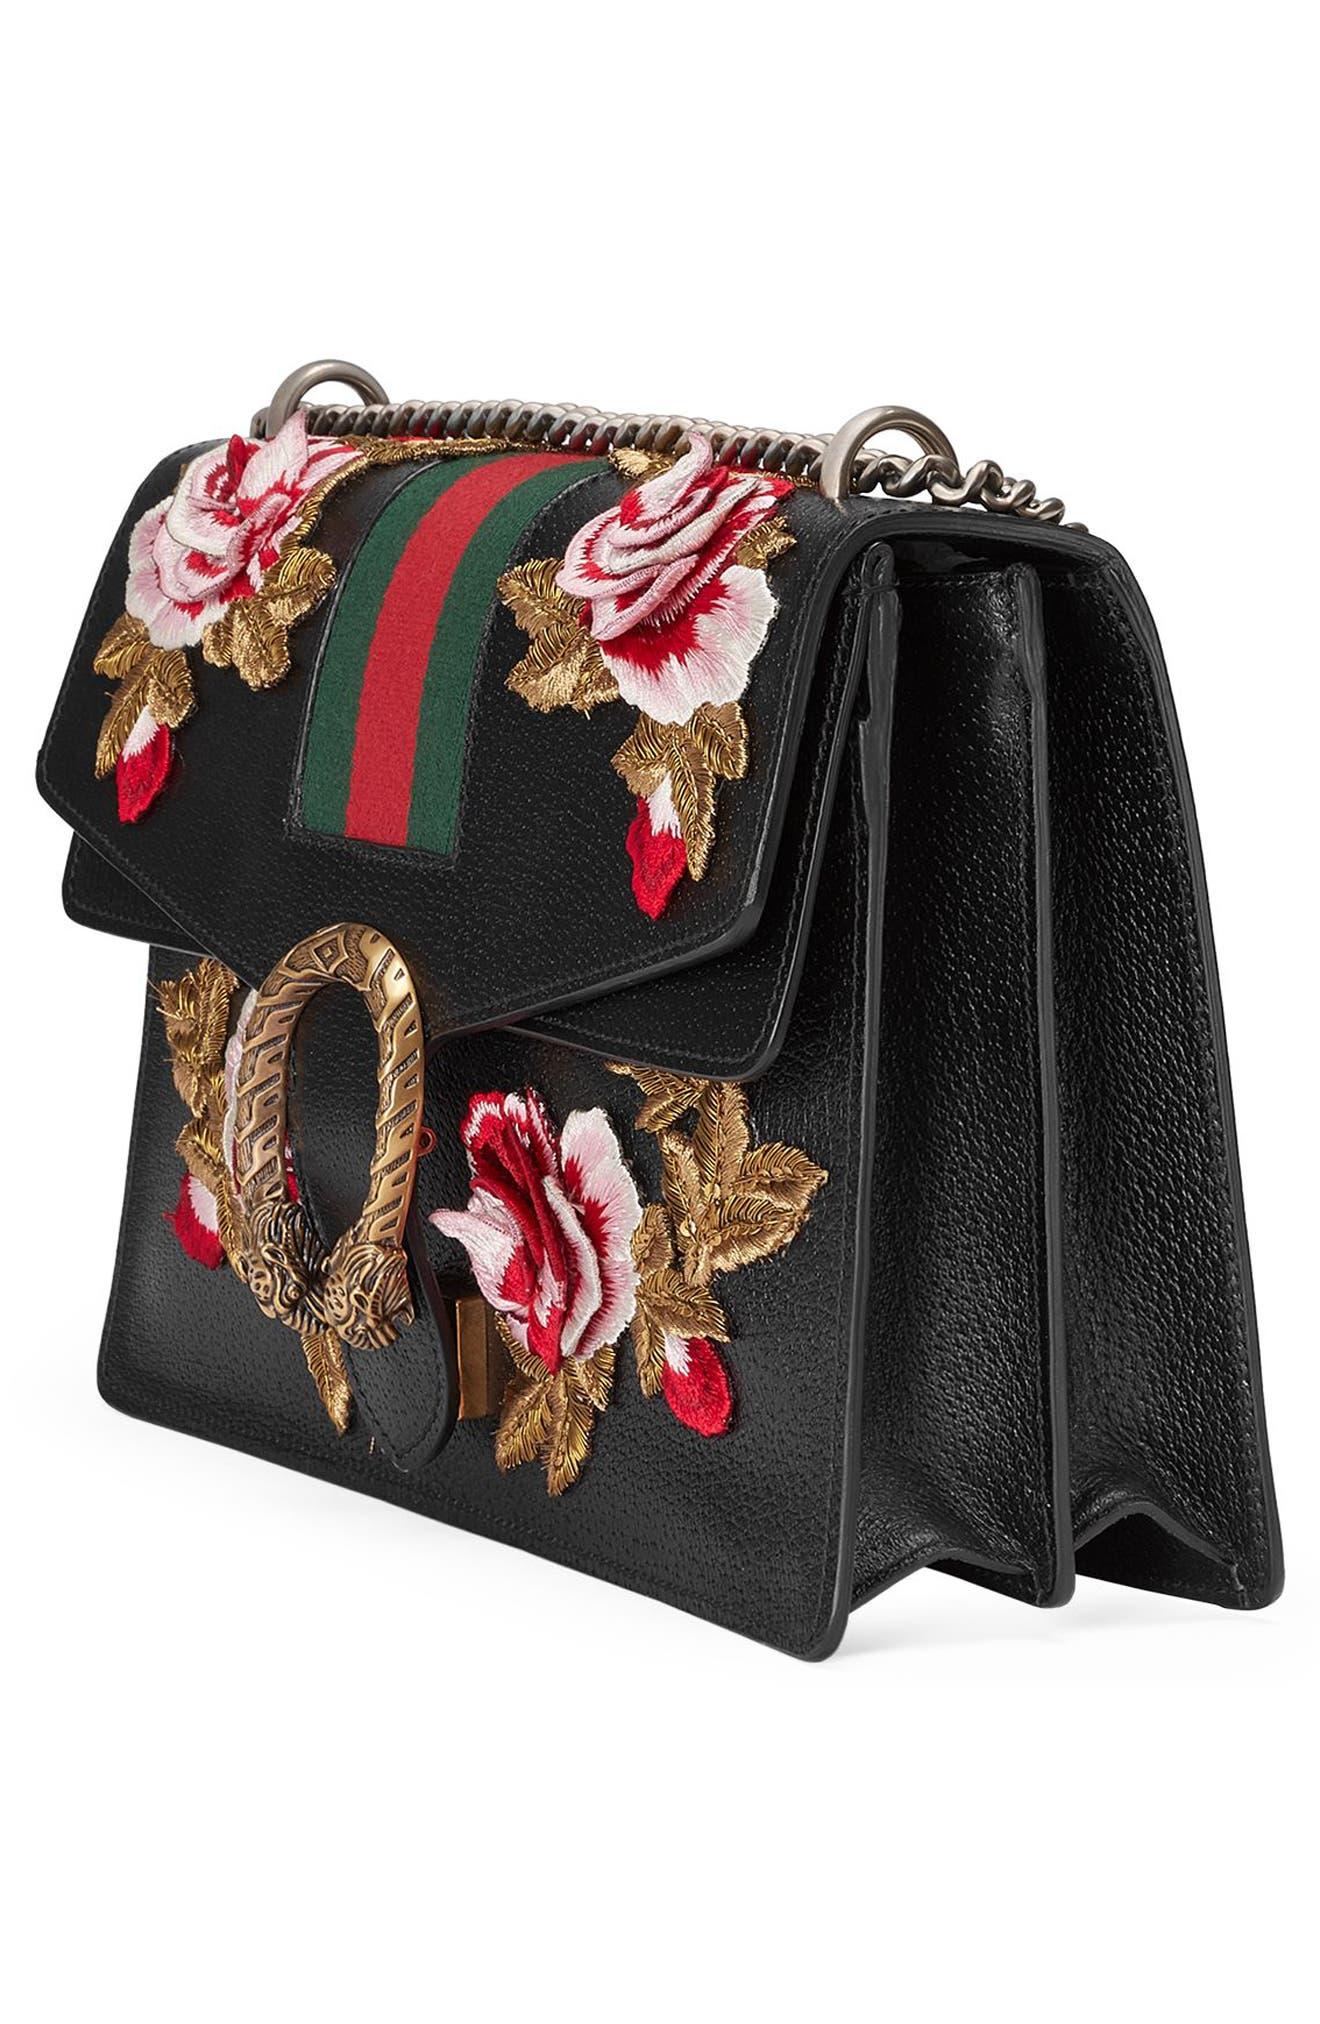 Medium Dionysus Embroidered Roses Leather Shoulder Bag,                             Alternate thumbnail 4, color,                             Nero/Multi